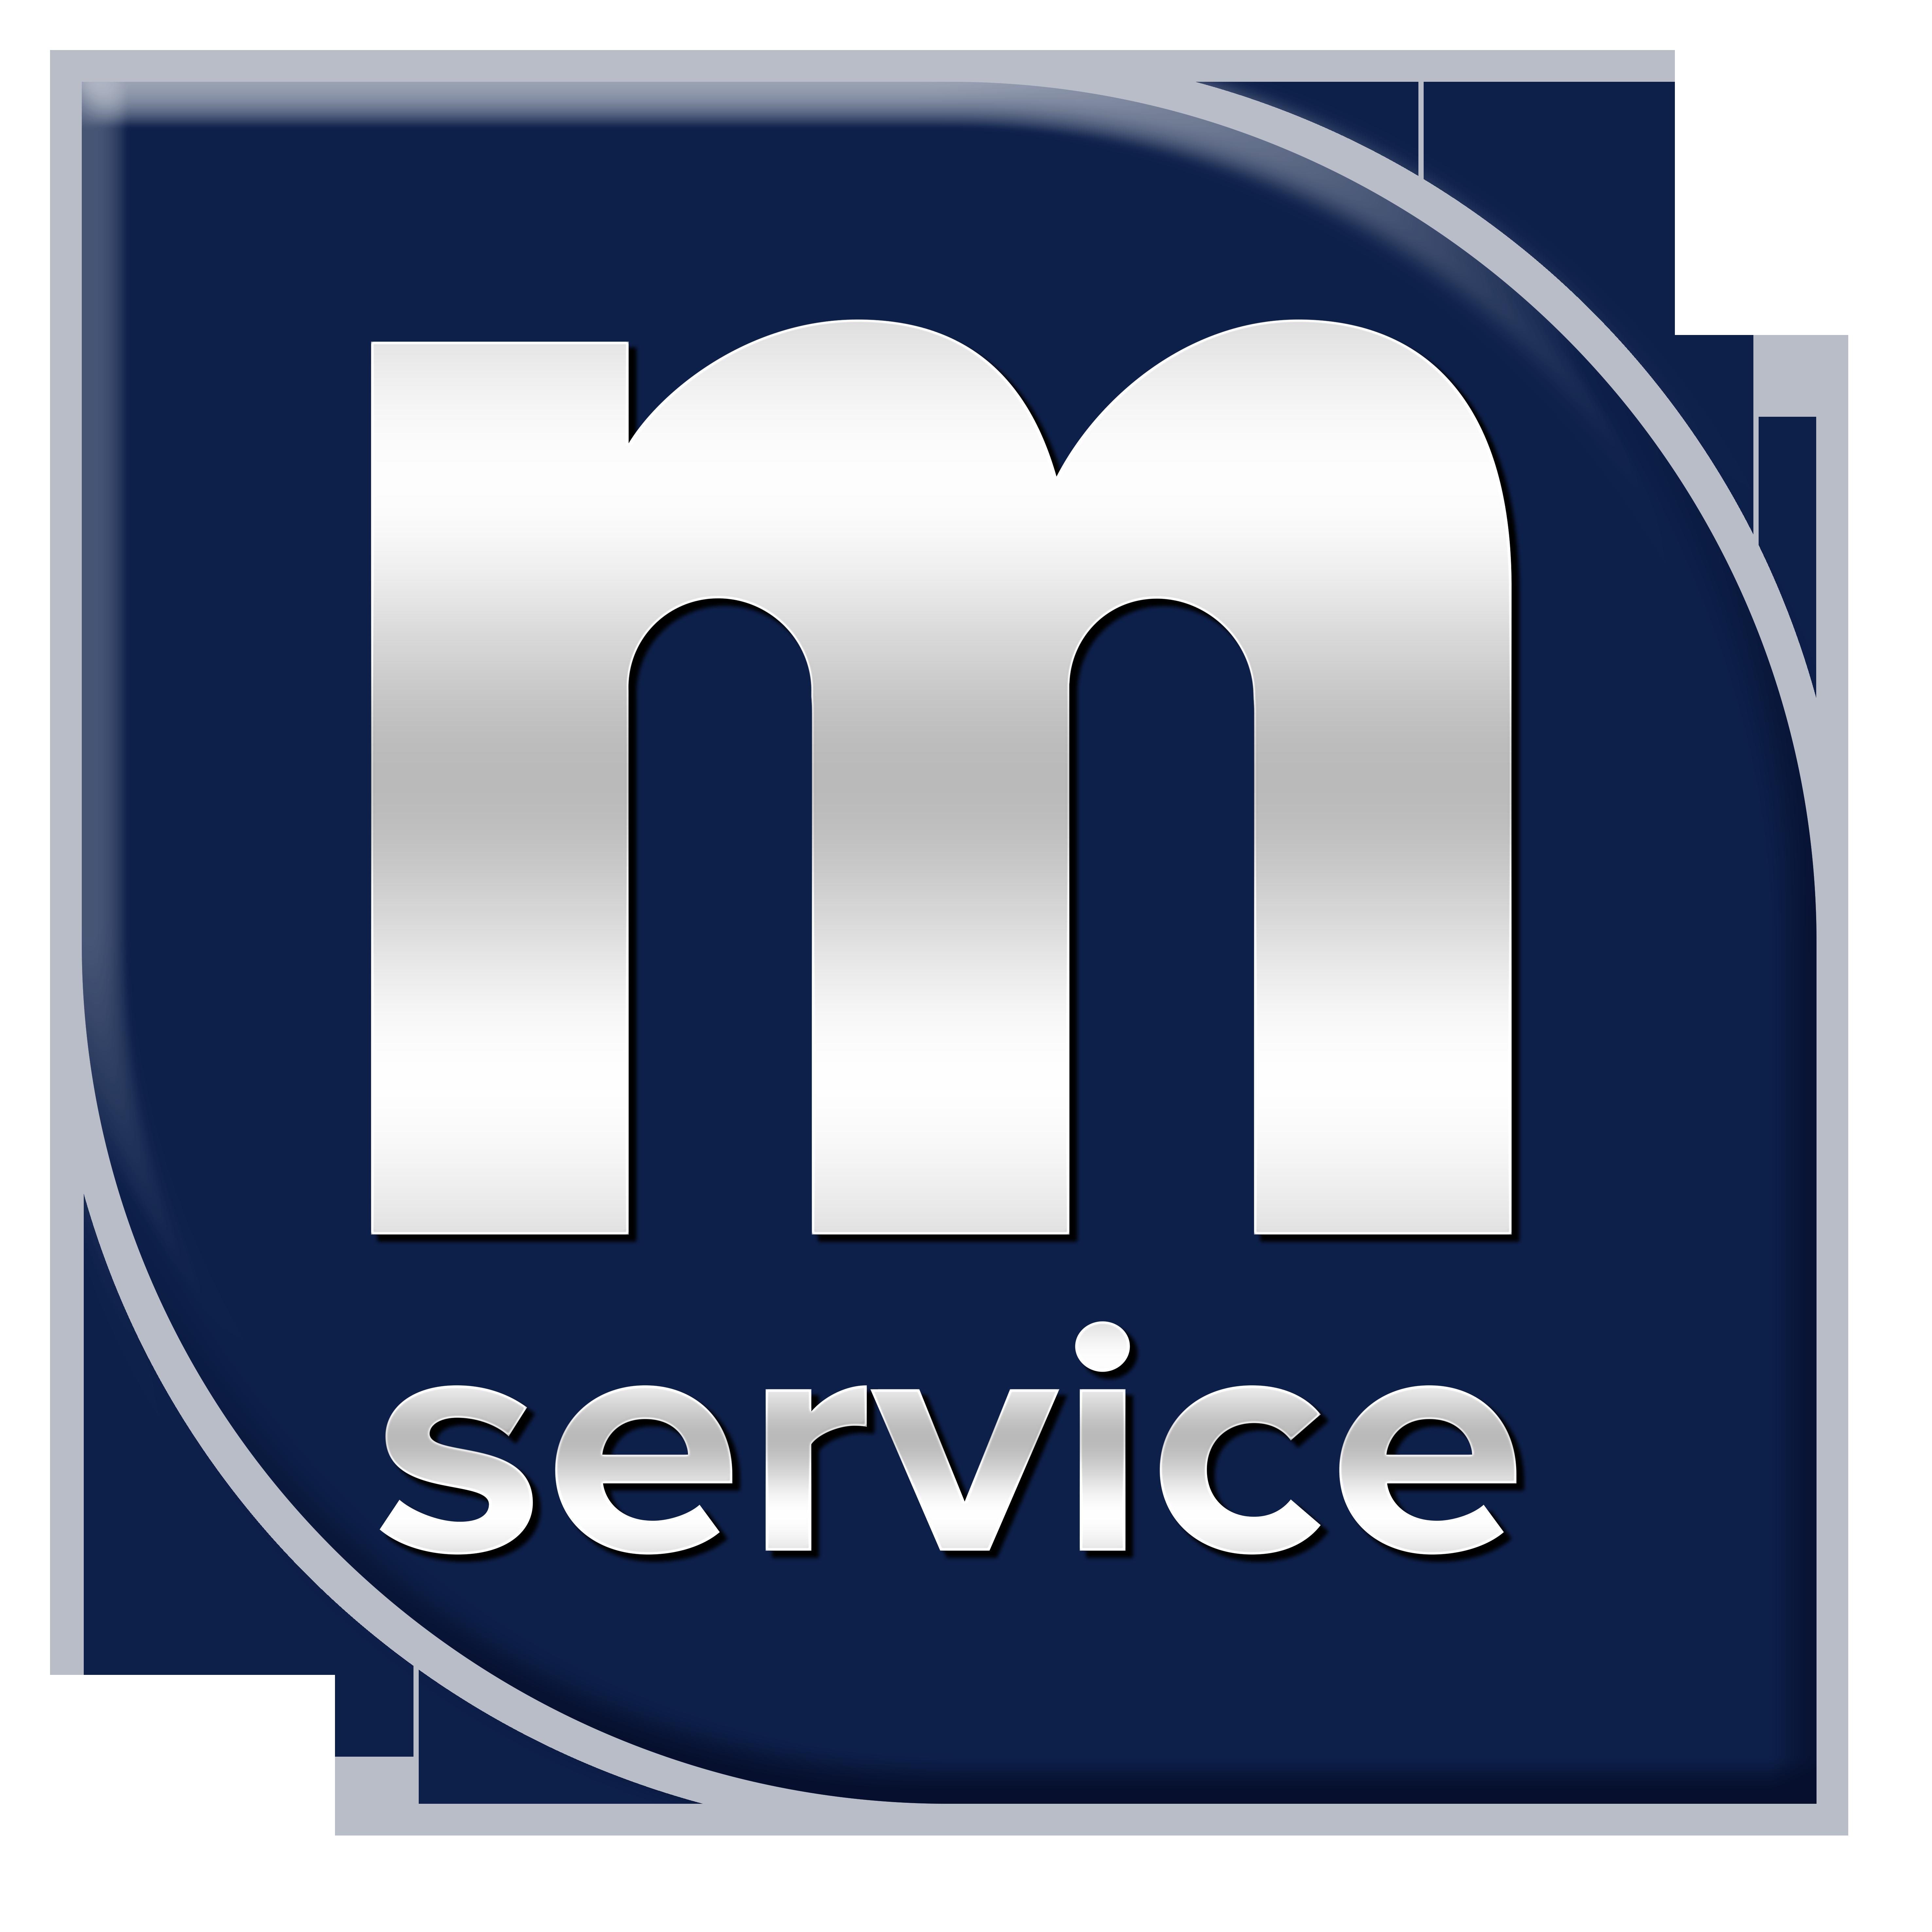 m-service logo